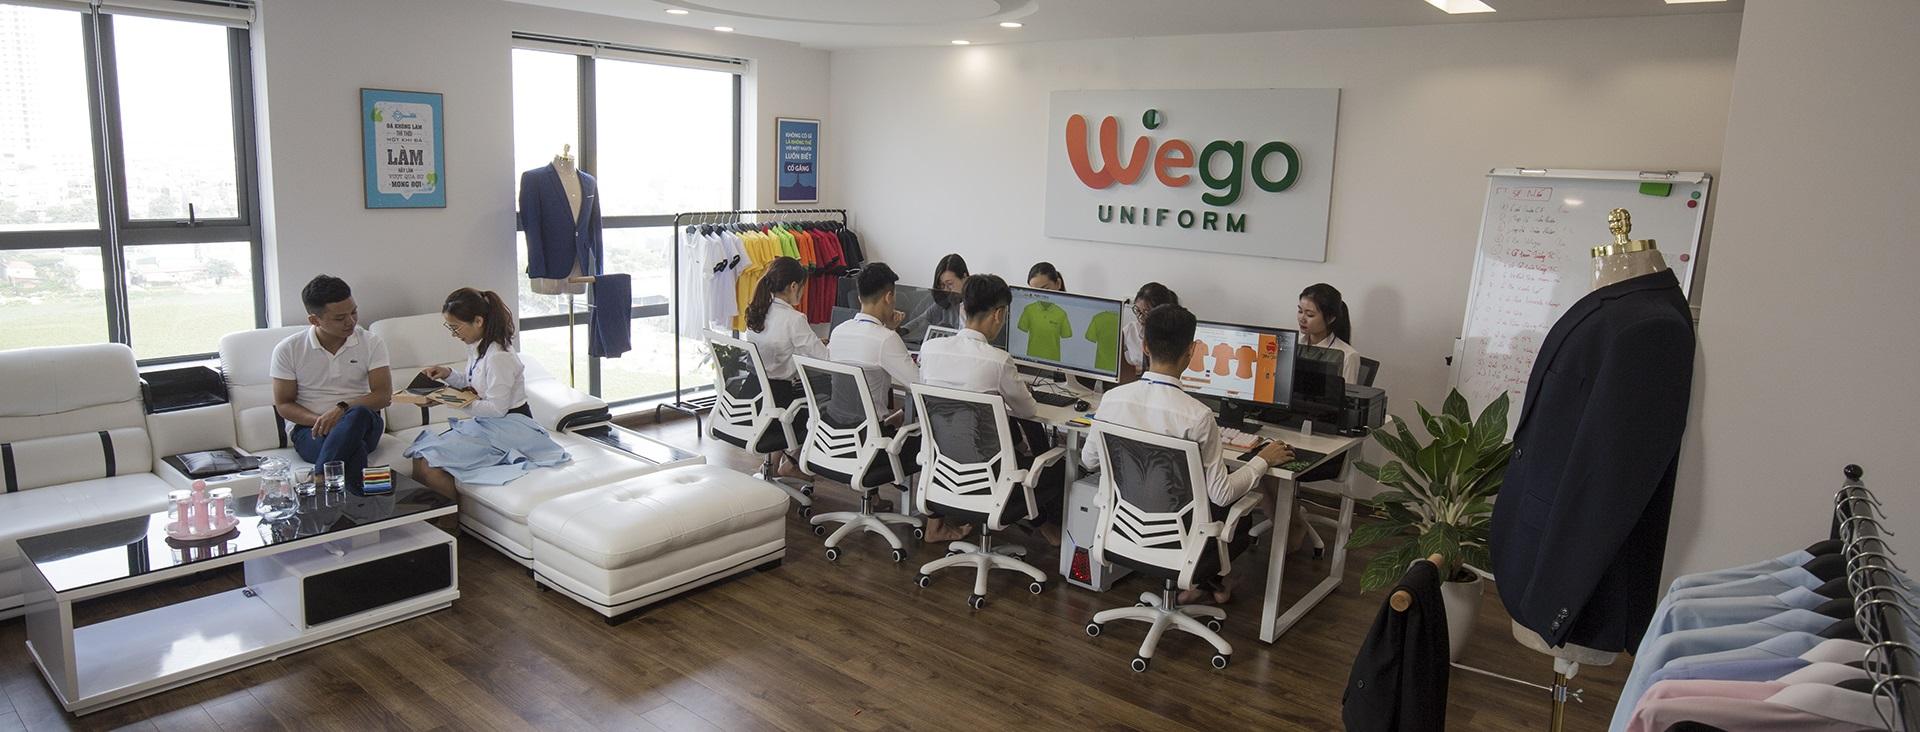 Đồng phục WeGo